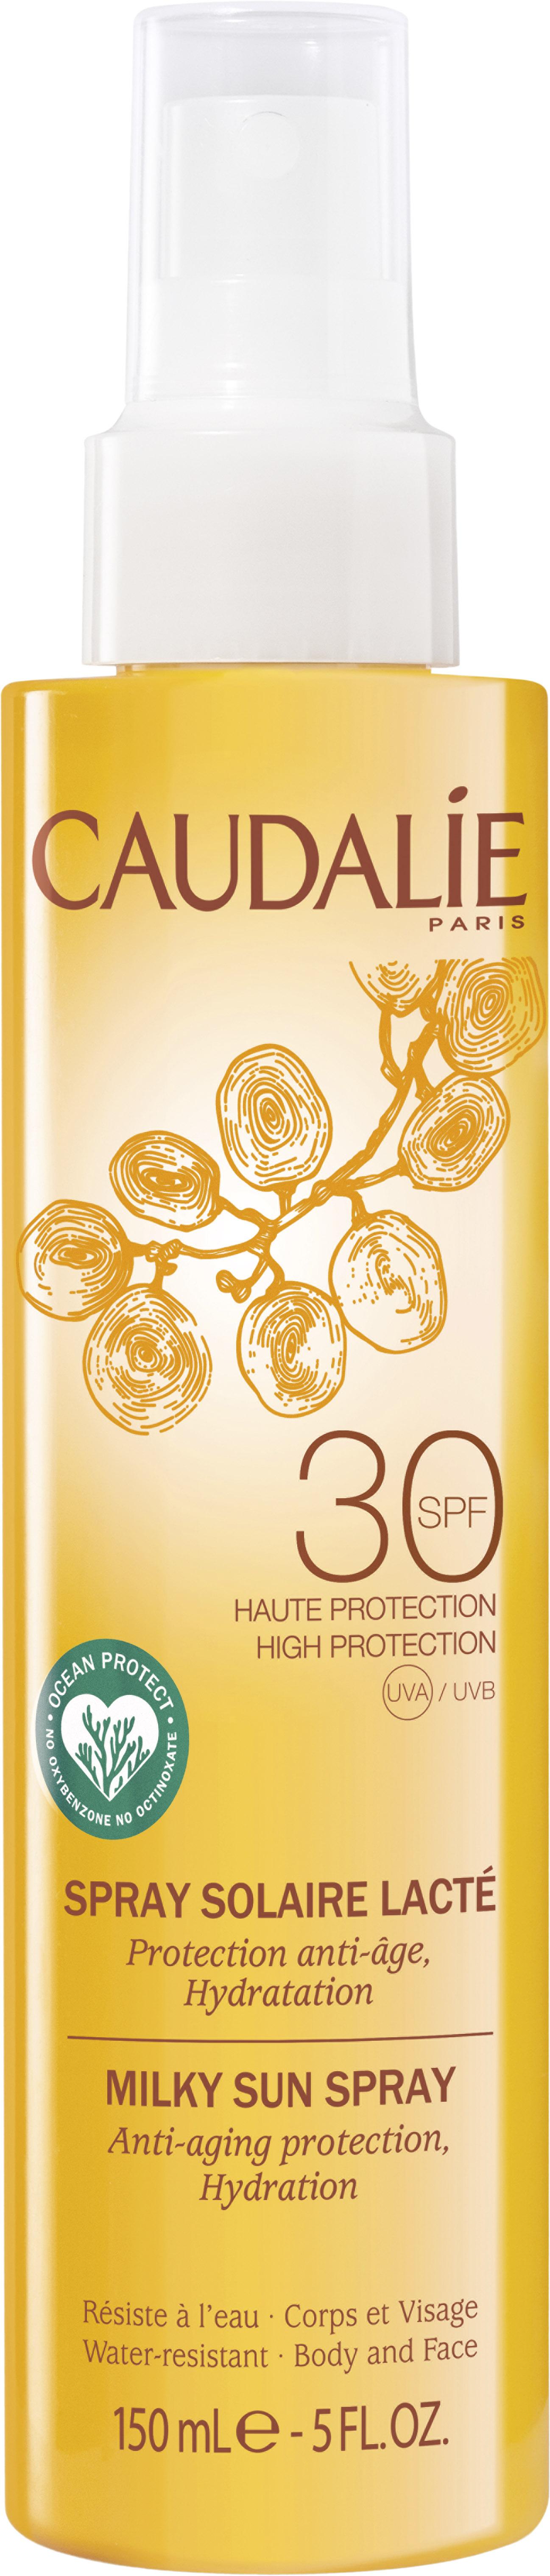 Caudalie - Milky Sun Spray SPF 30 150 ml